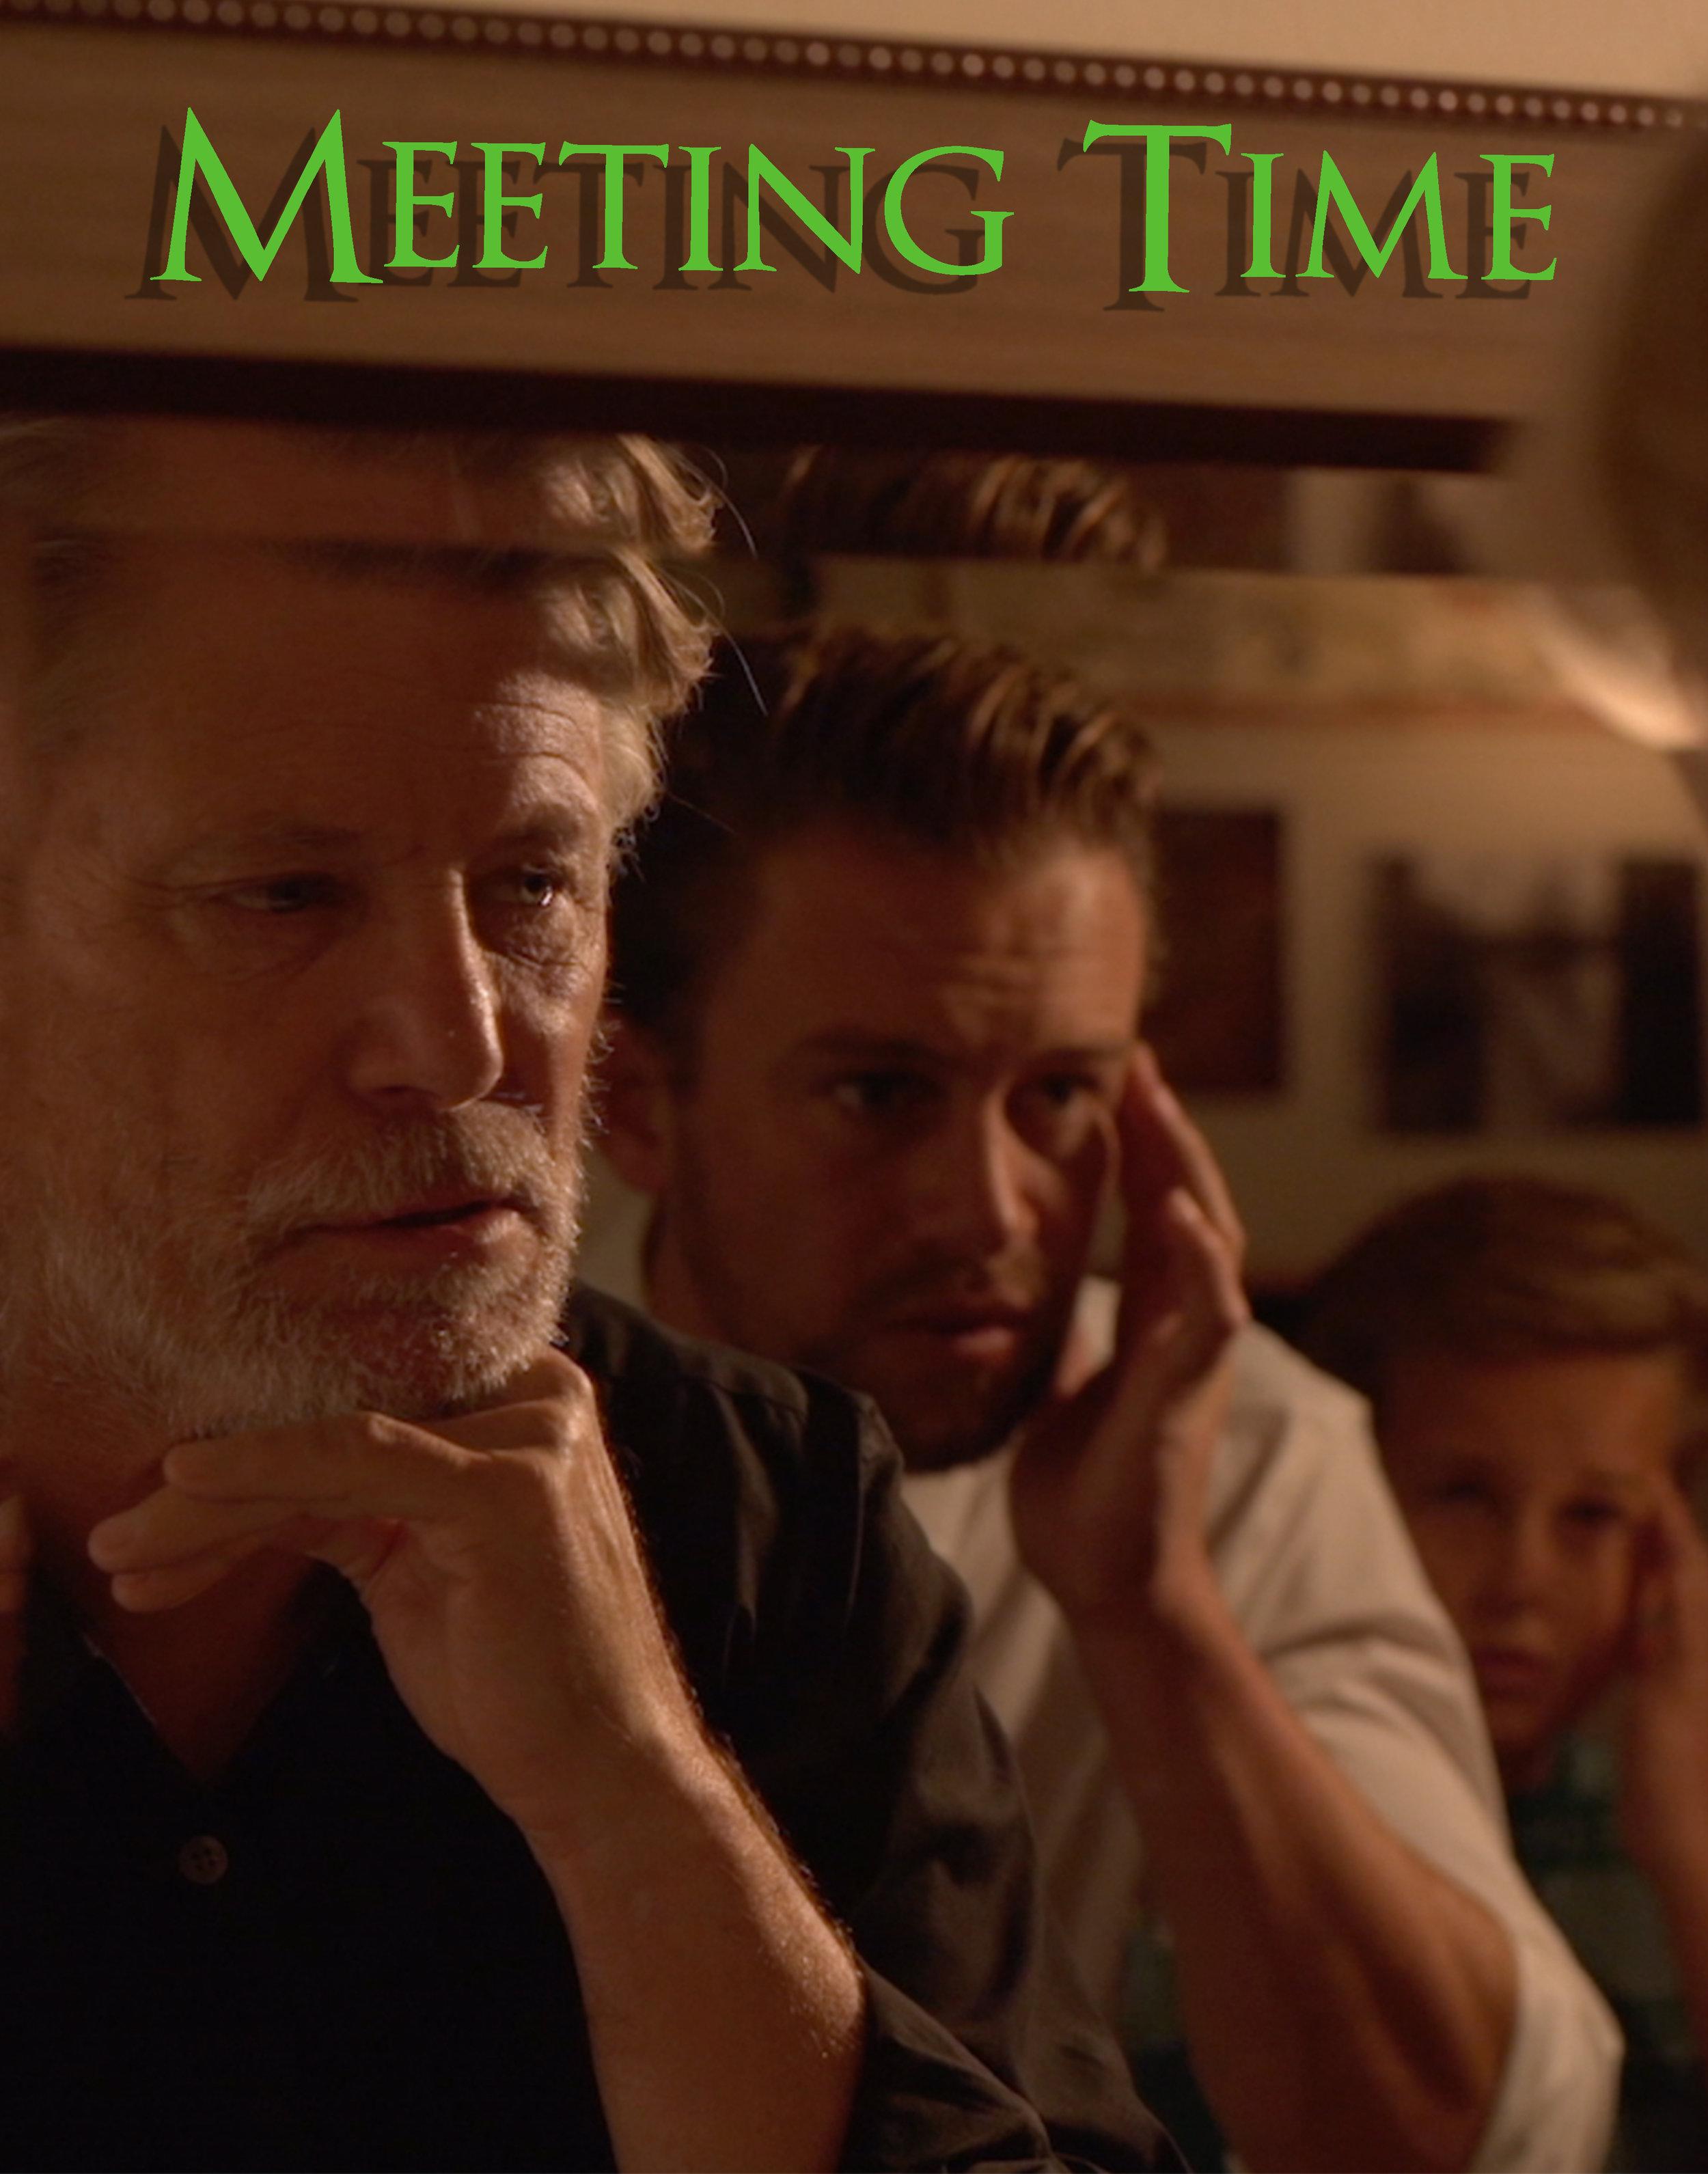 Meeting Time_Program Poster (CORRECT).jpg